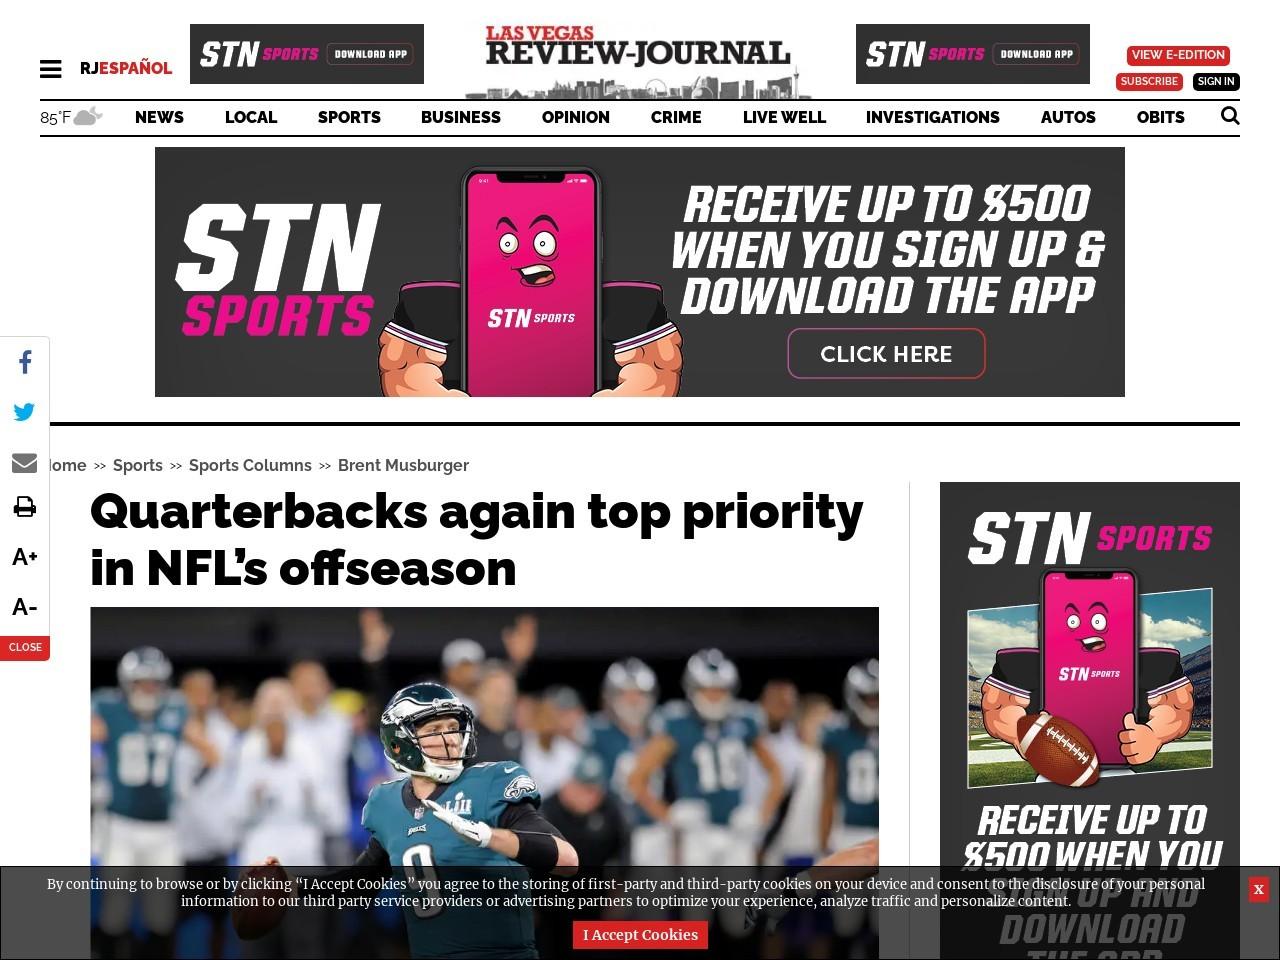 Quarterbacks again top priority in NFL's offseason